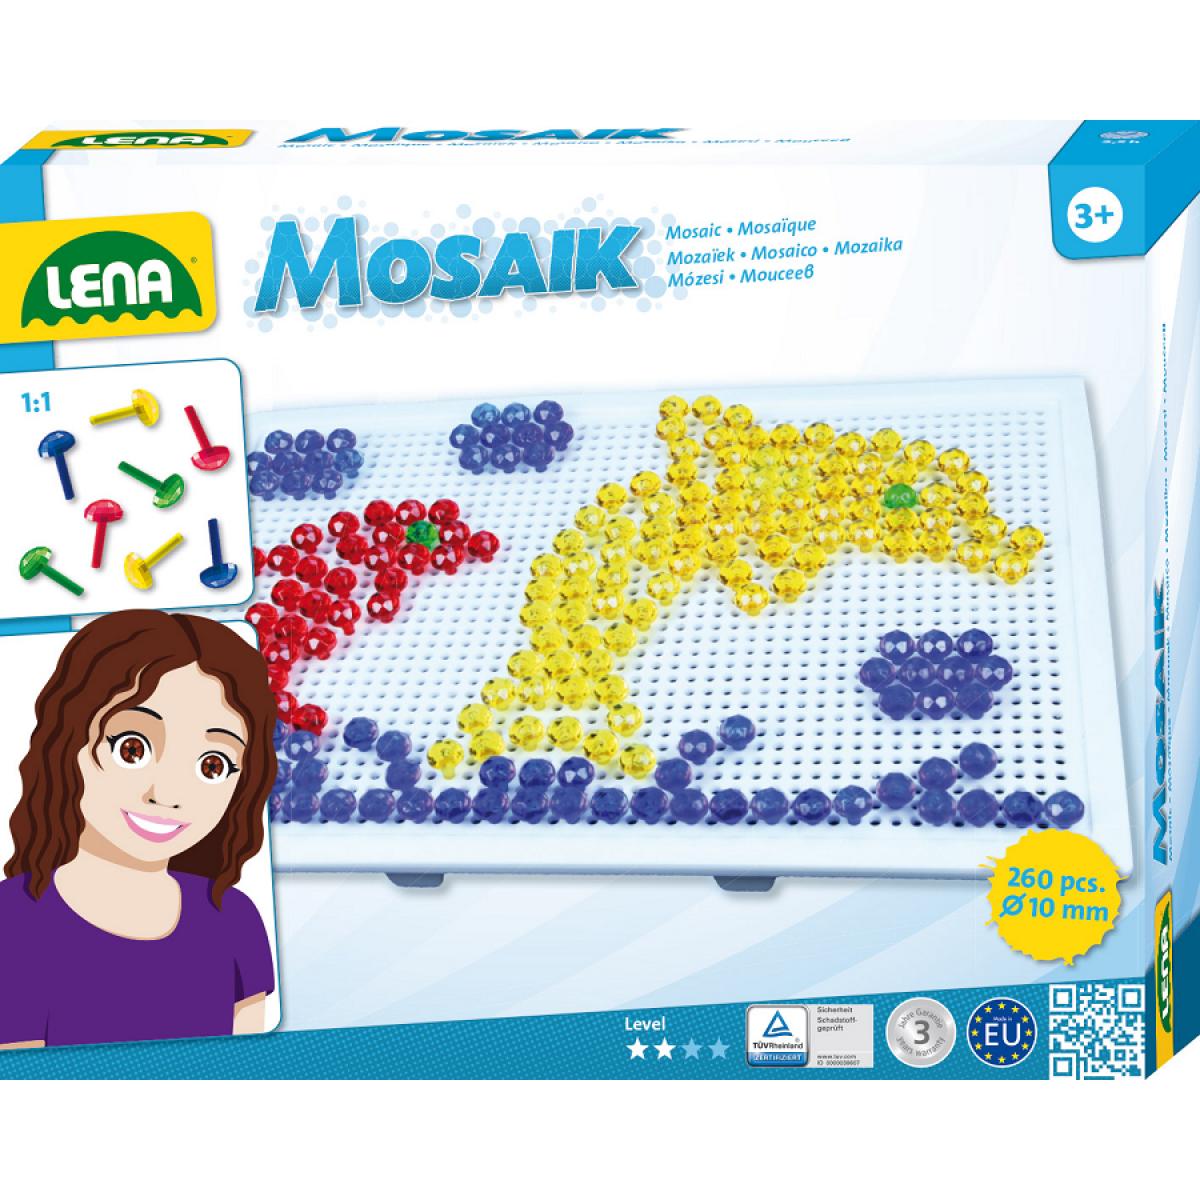 Lena Mozaika velká 260ks klobouček 10mm krystal